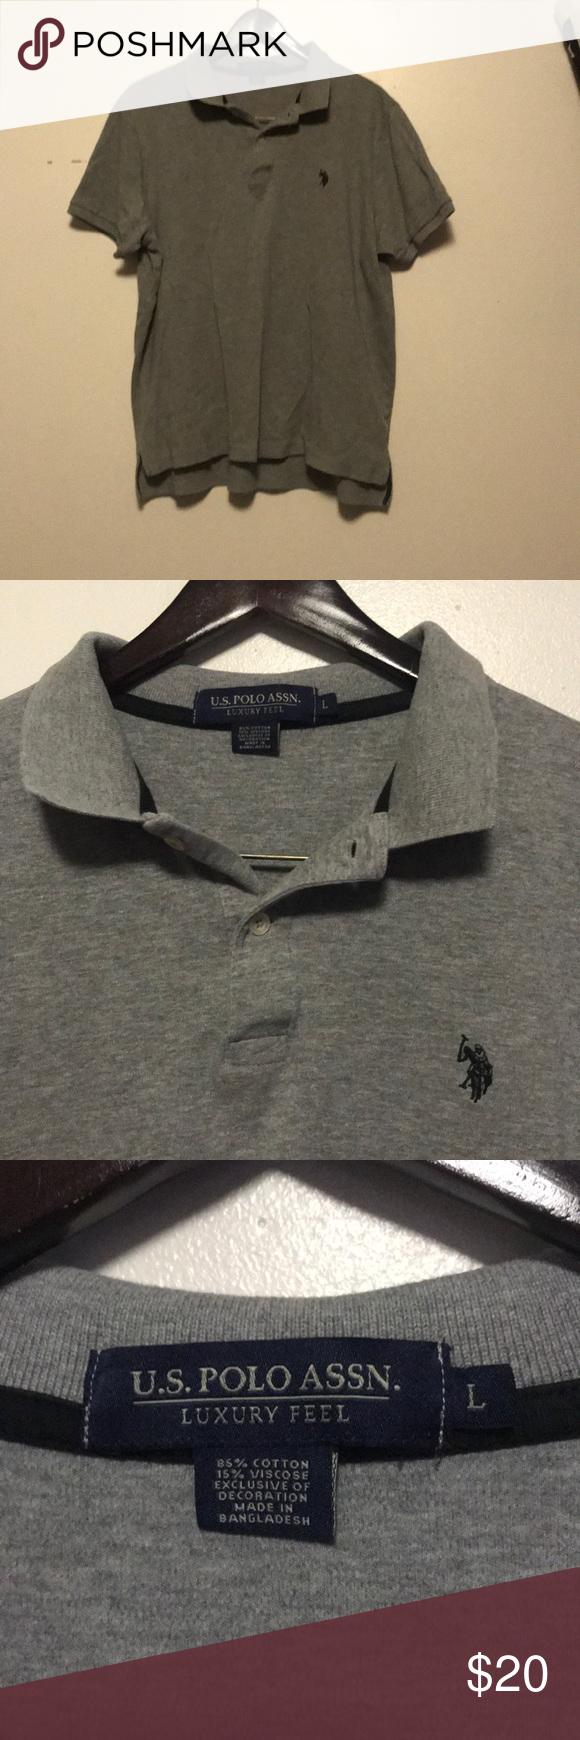 Us Polo Assn Luxury Feel Polo Us Polo Assn Luxury Feel Polo Dress Shirt Color Is Grey With Black Polo Logo No Polo Shirt Dress Comfy Shirts Clothes Design